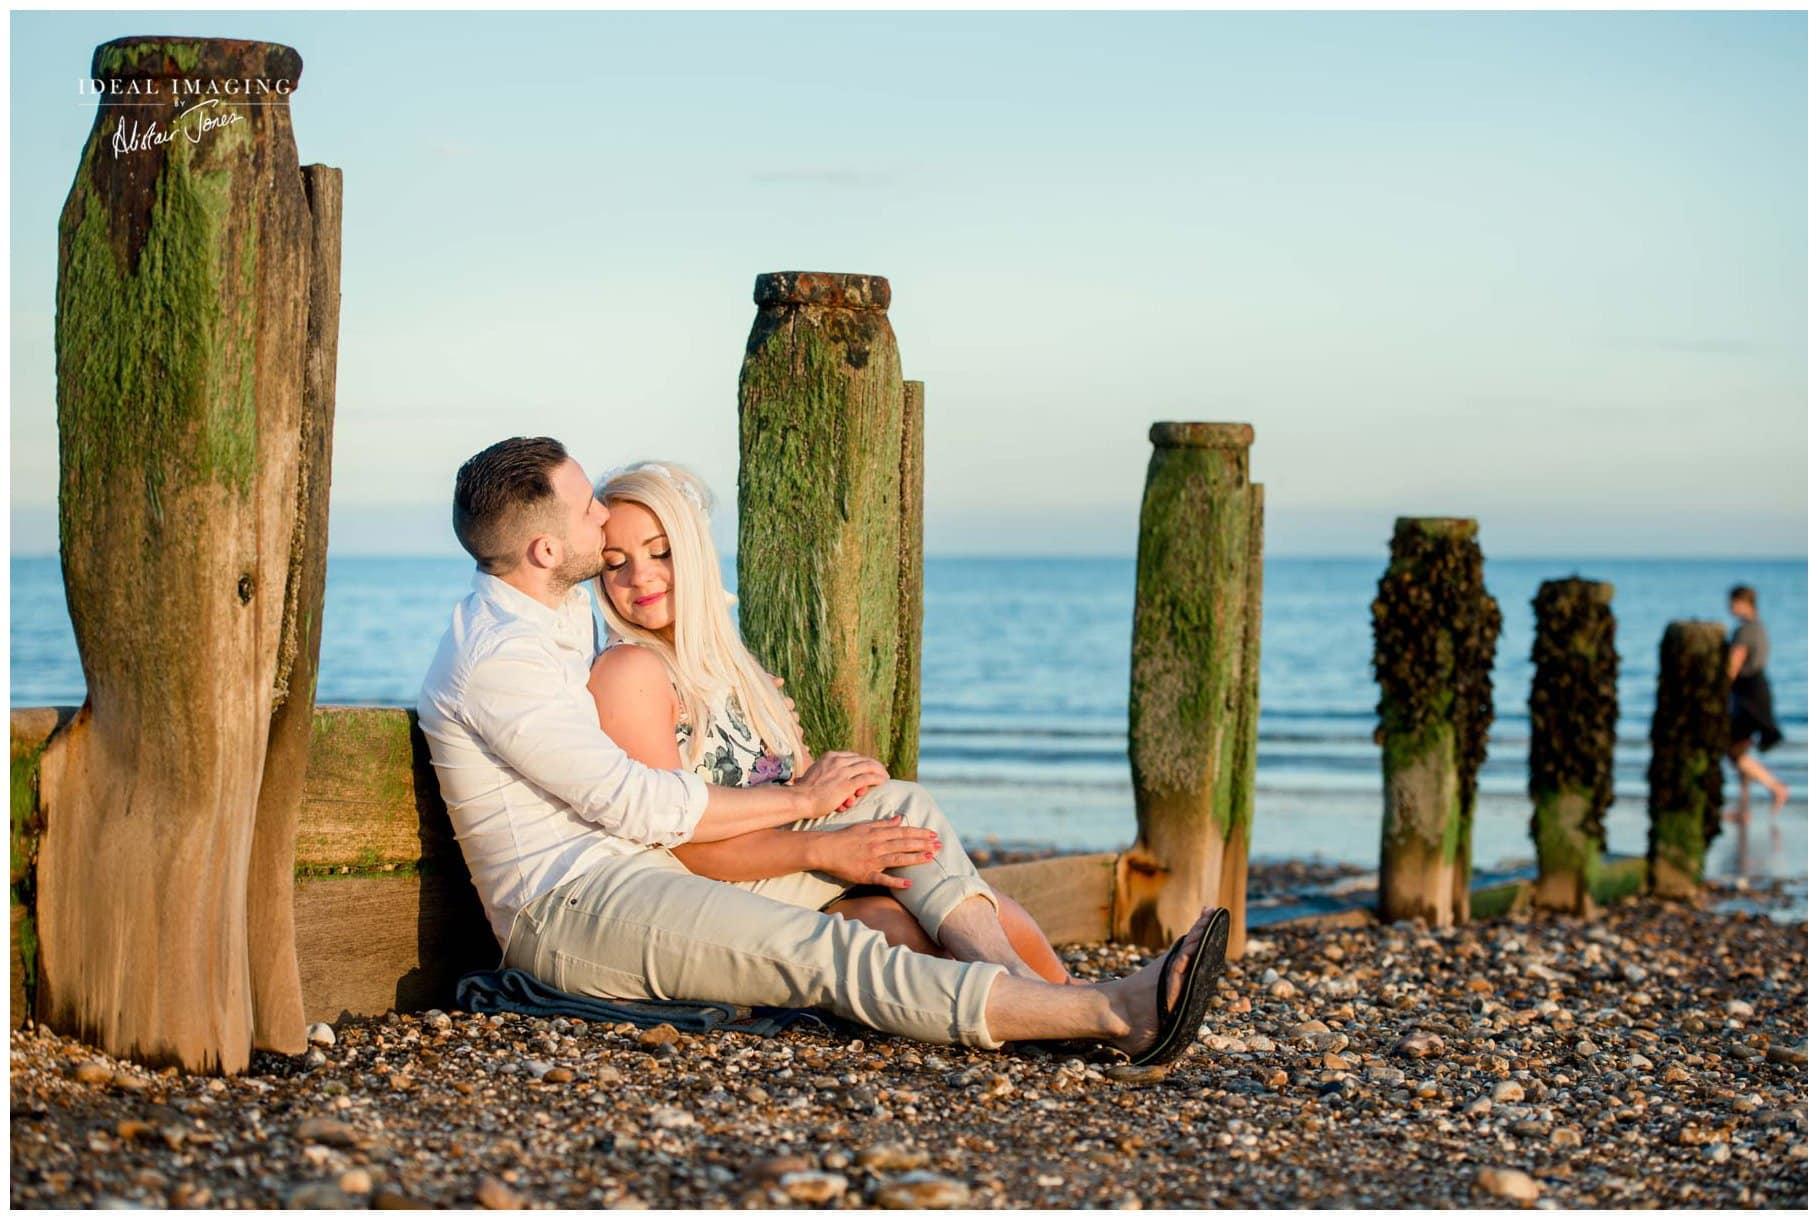 beach_engagement_photoshoot_hayling_island-046